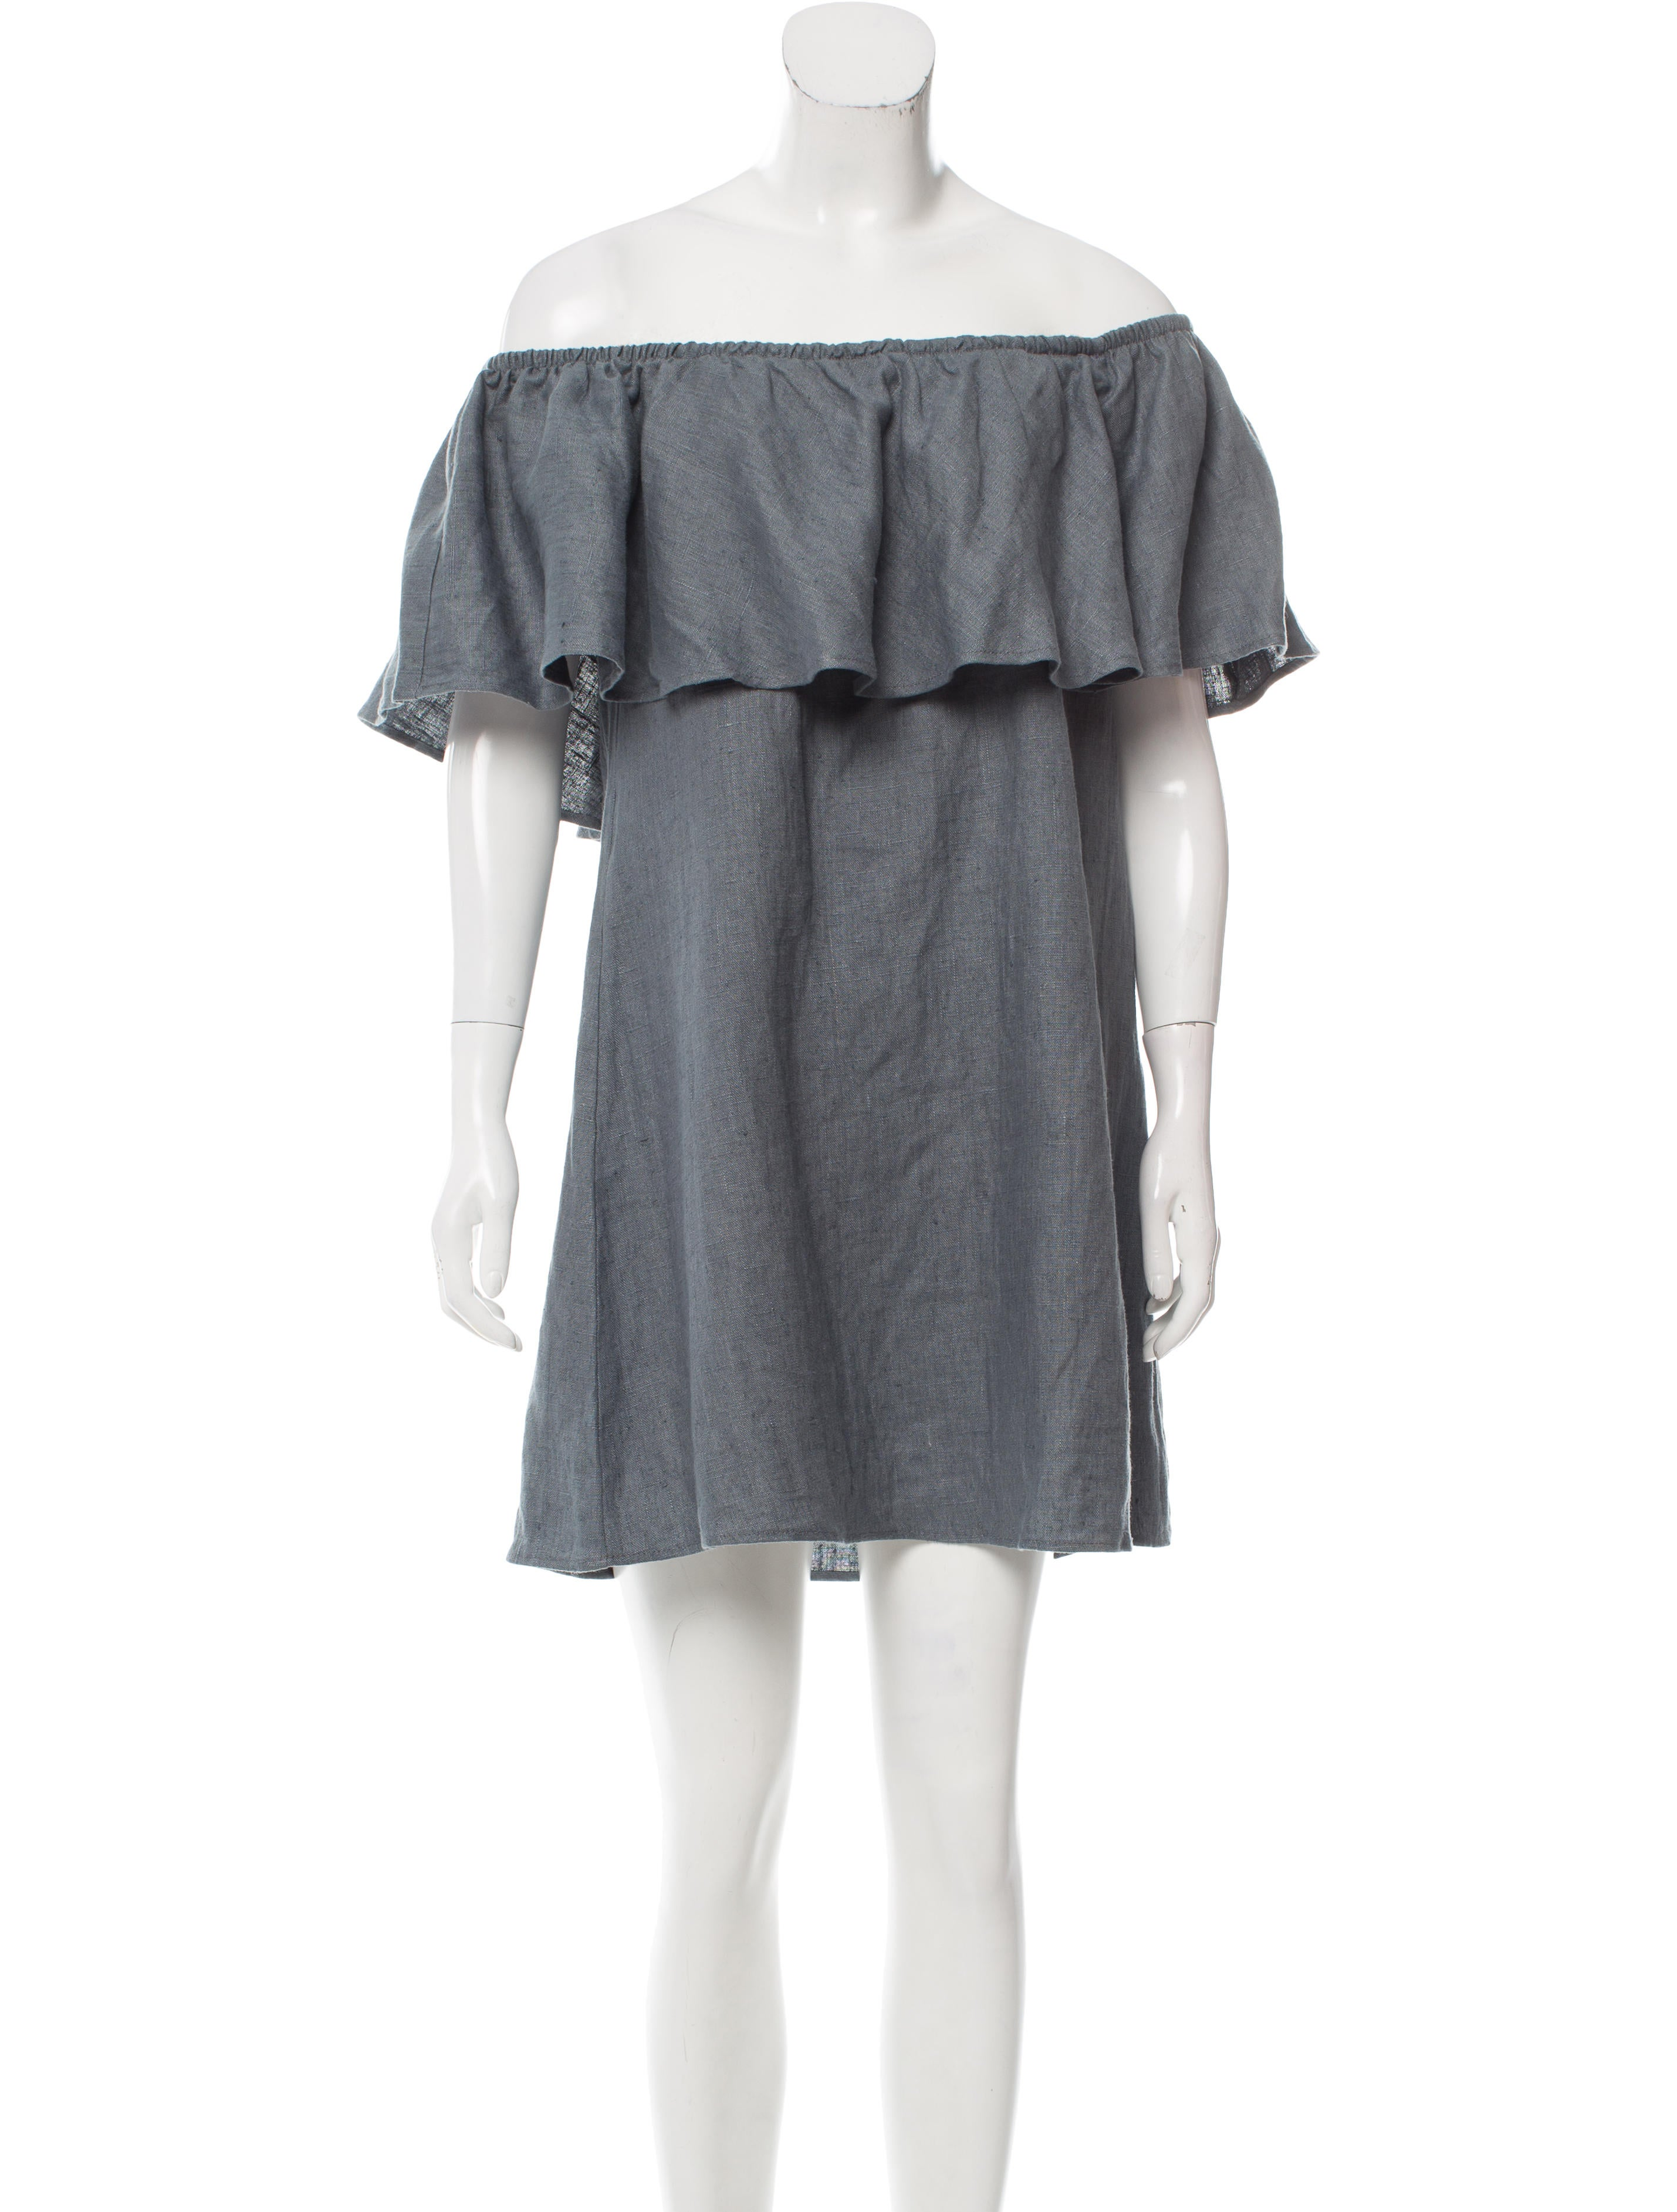 d0ca903a4717 Reformation Nashville Off-the-Shoulder Dress w  Tags - Clothing ...